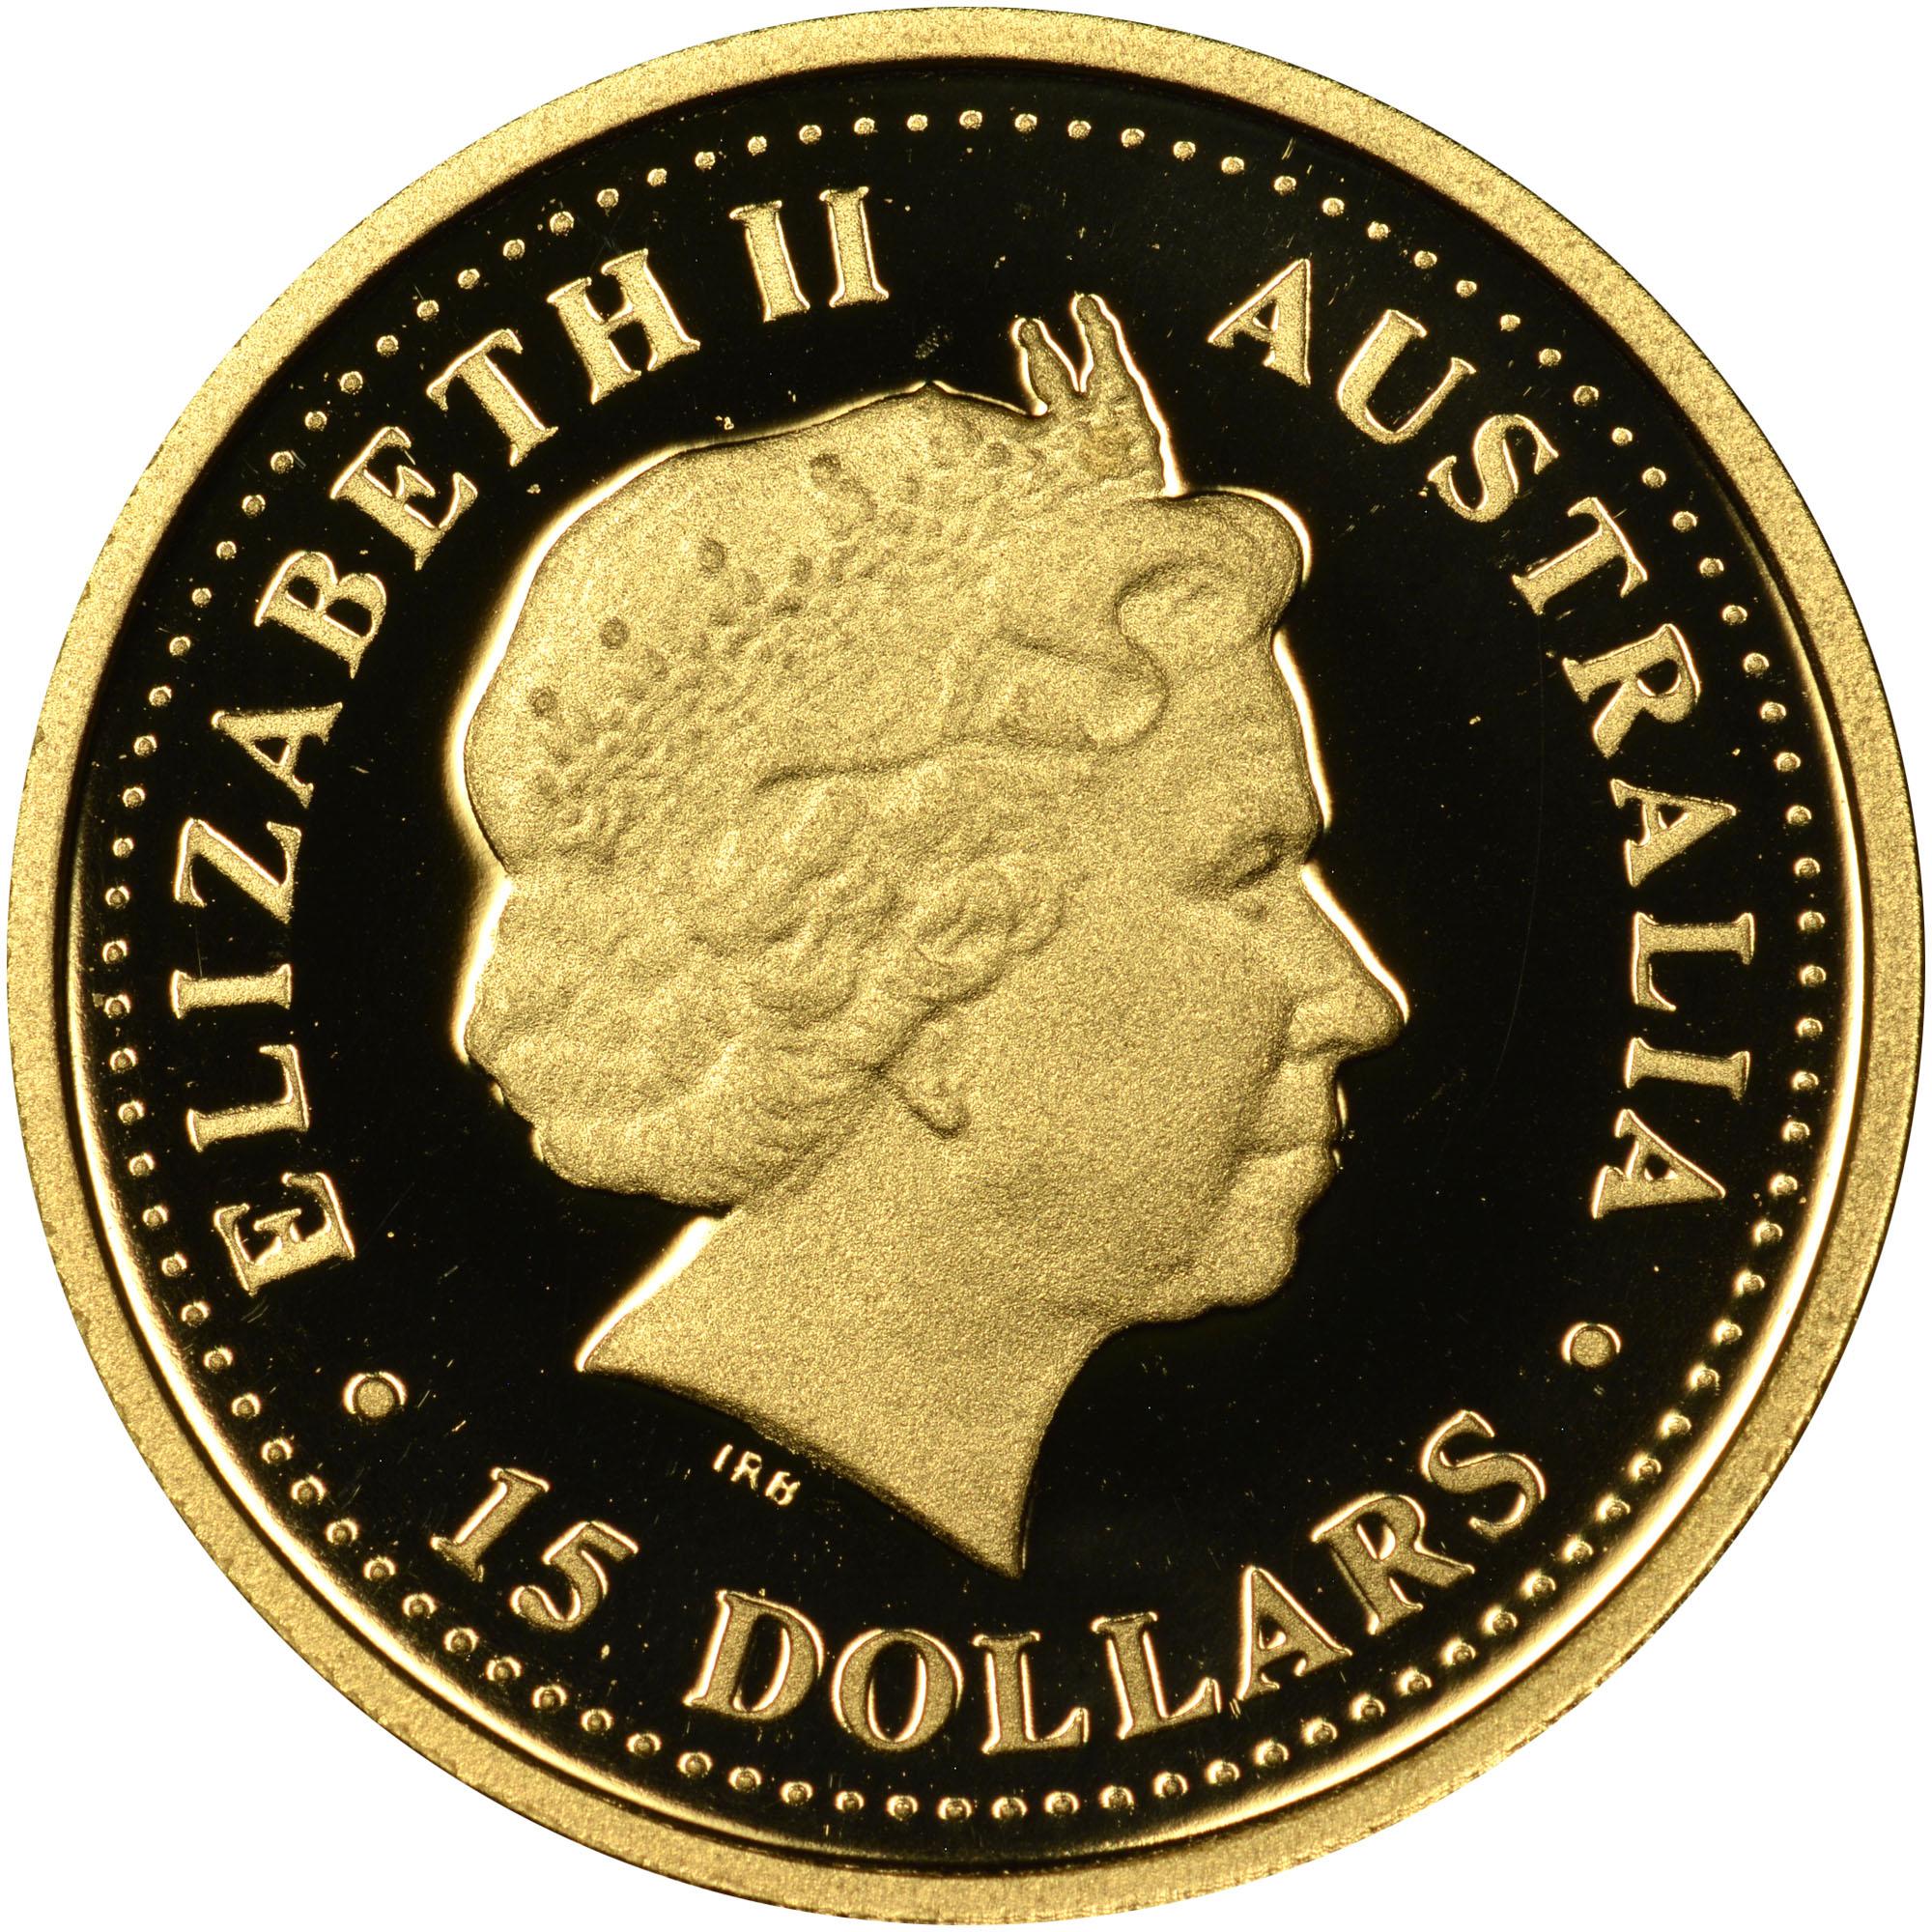 2006 Australia 15 Dollars obverse